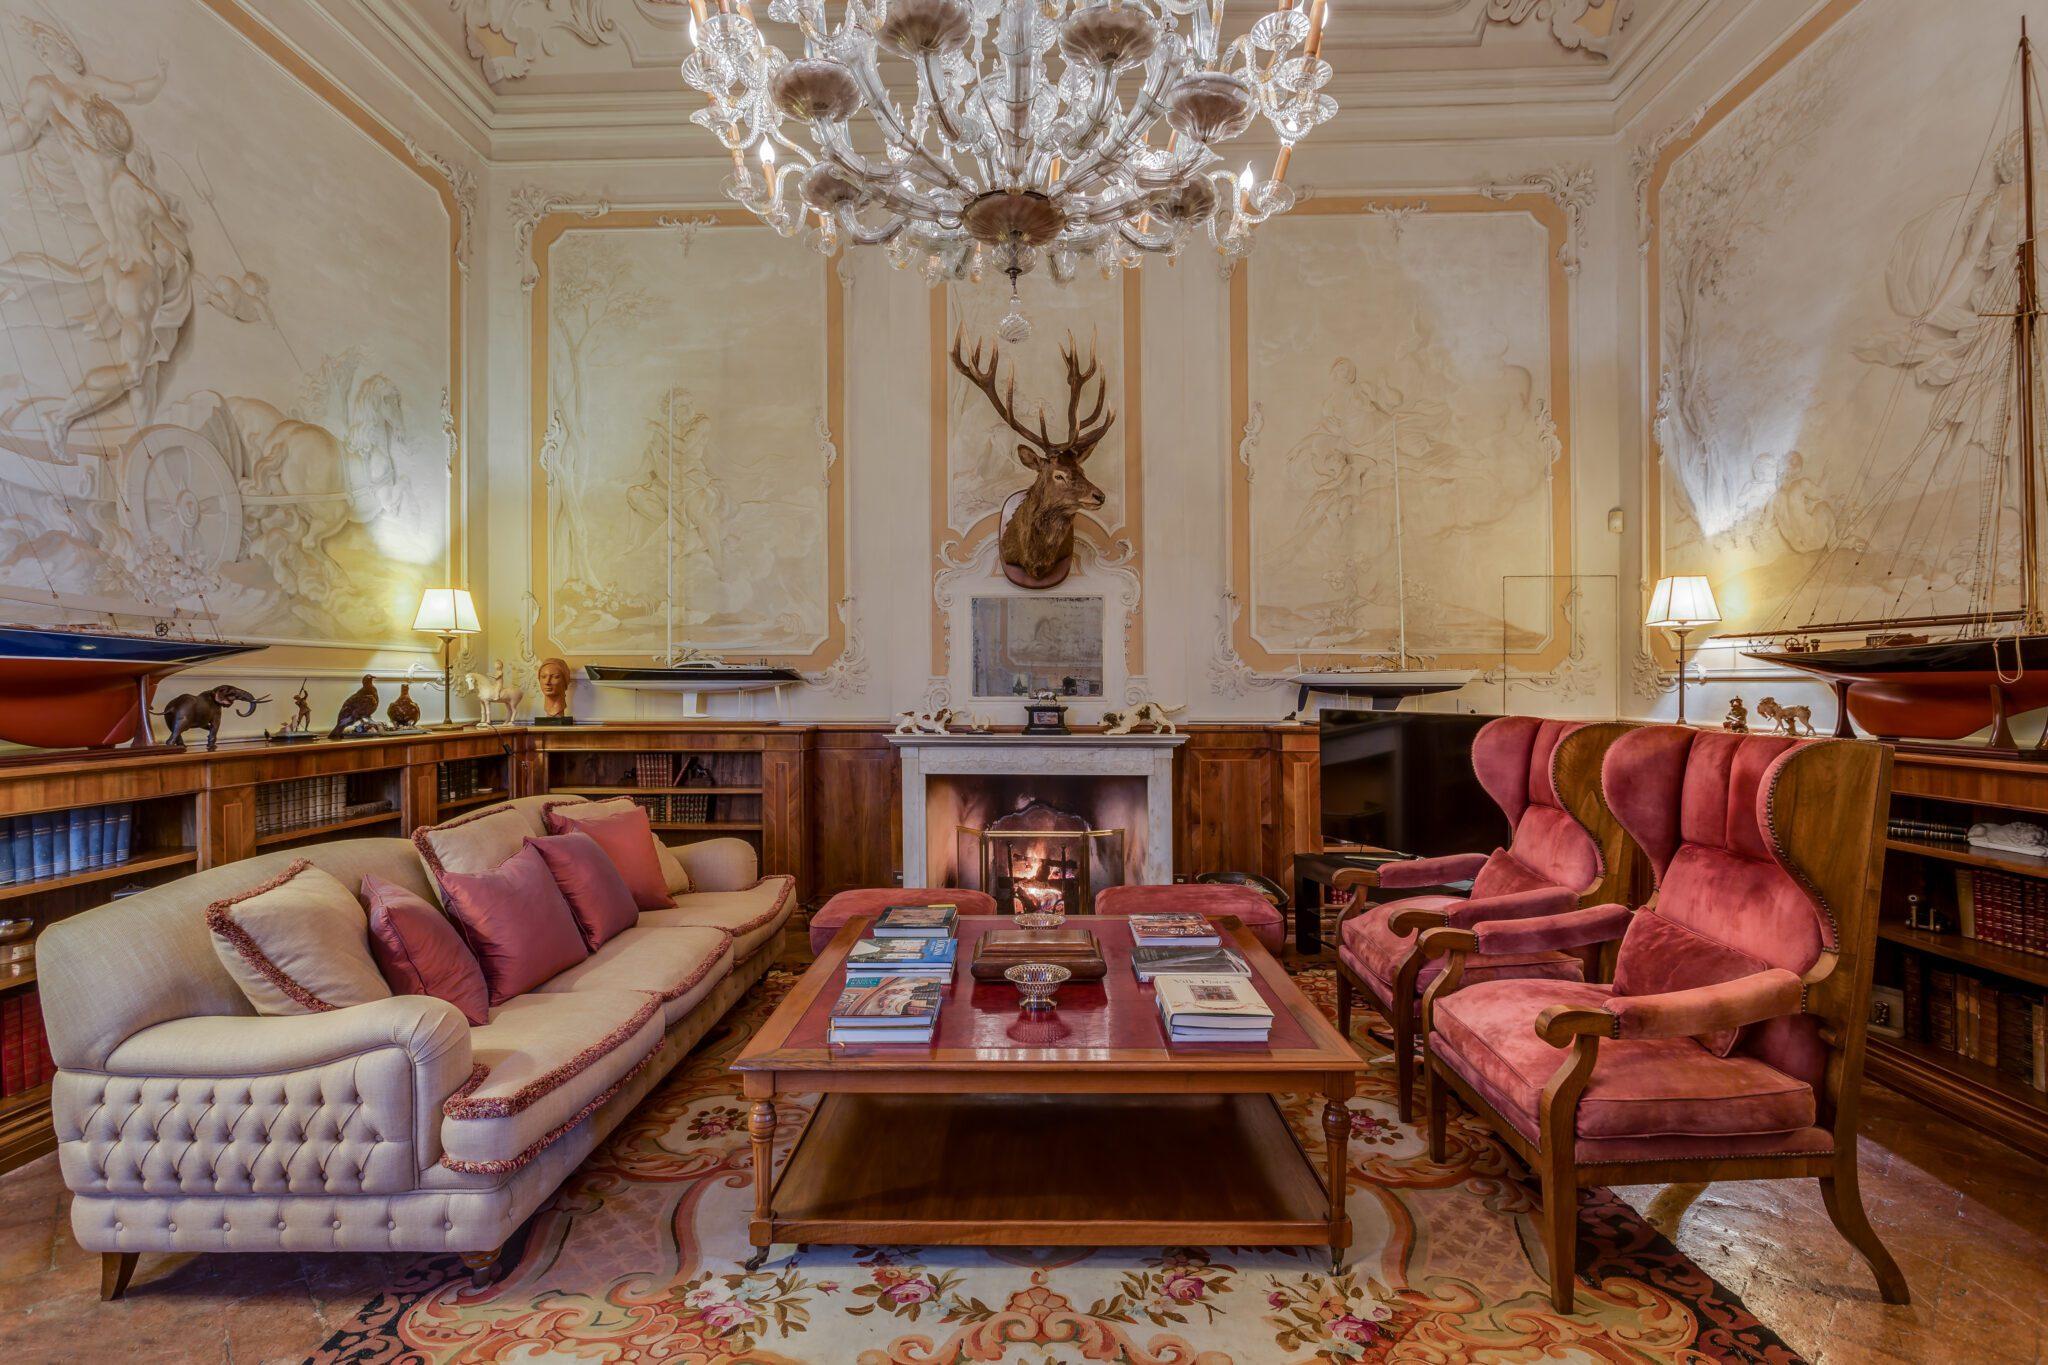 Nest Italy - Renaissance Villa in Florence